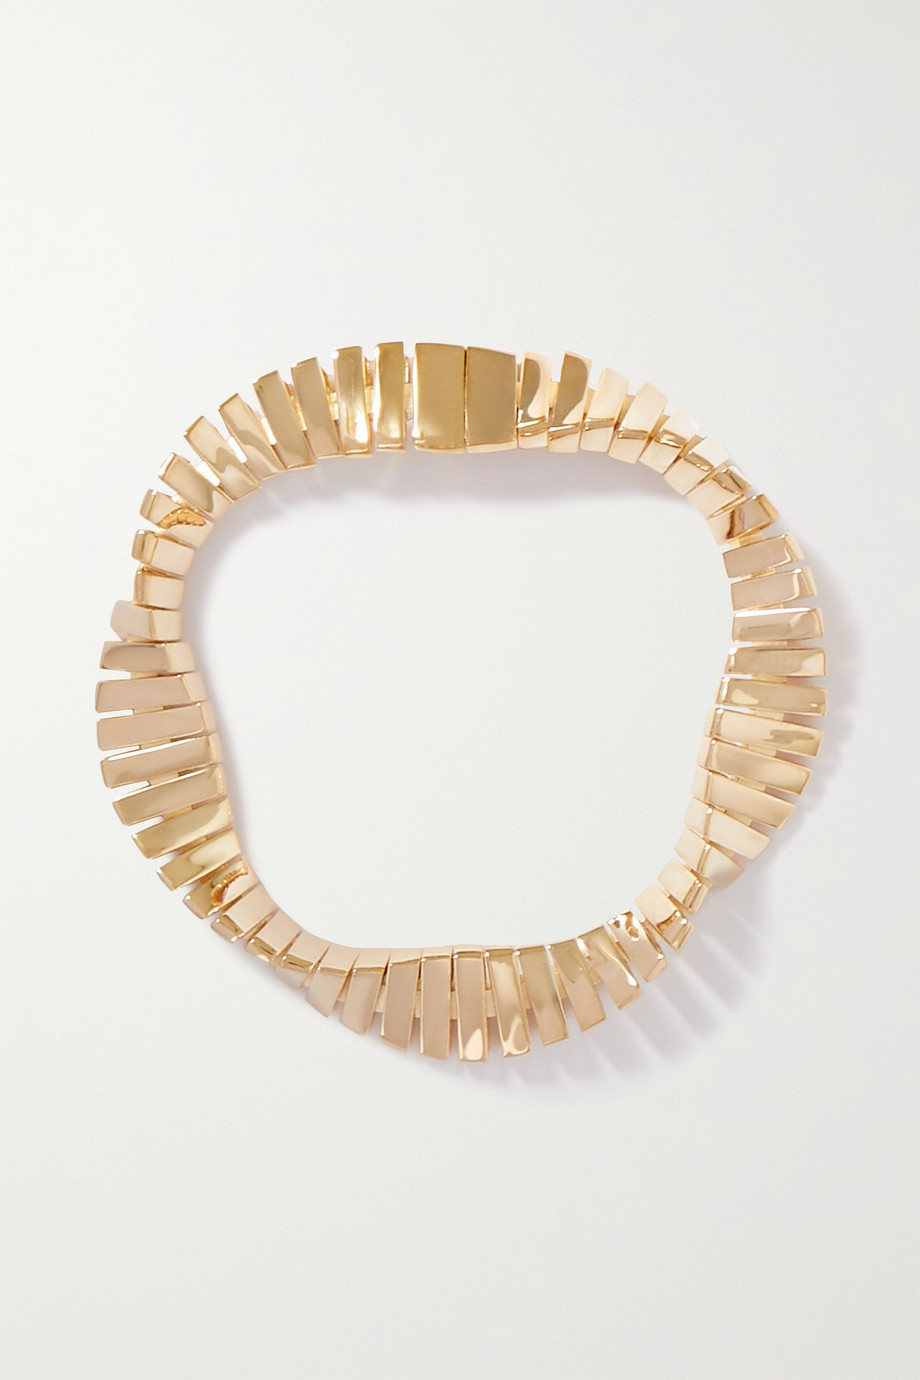 Bottega Veneta Twist gold-plated bracelet